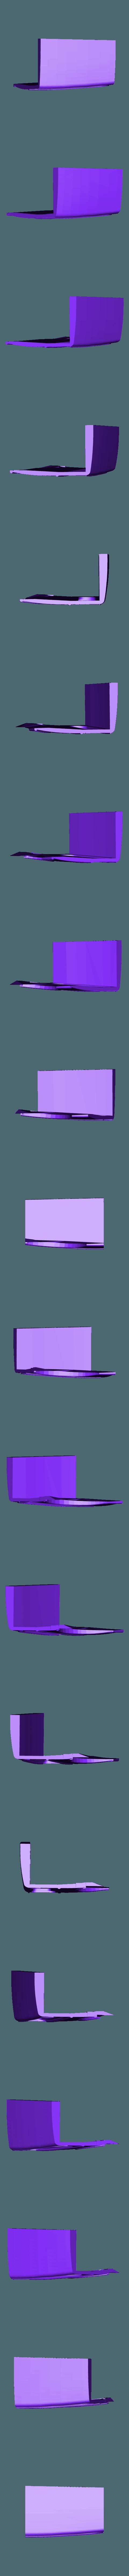 hotrod flanc 5.stl Download STL file Fury road hotrod bodyshell 1/10 • 3D printing design, RCGANG93